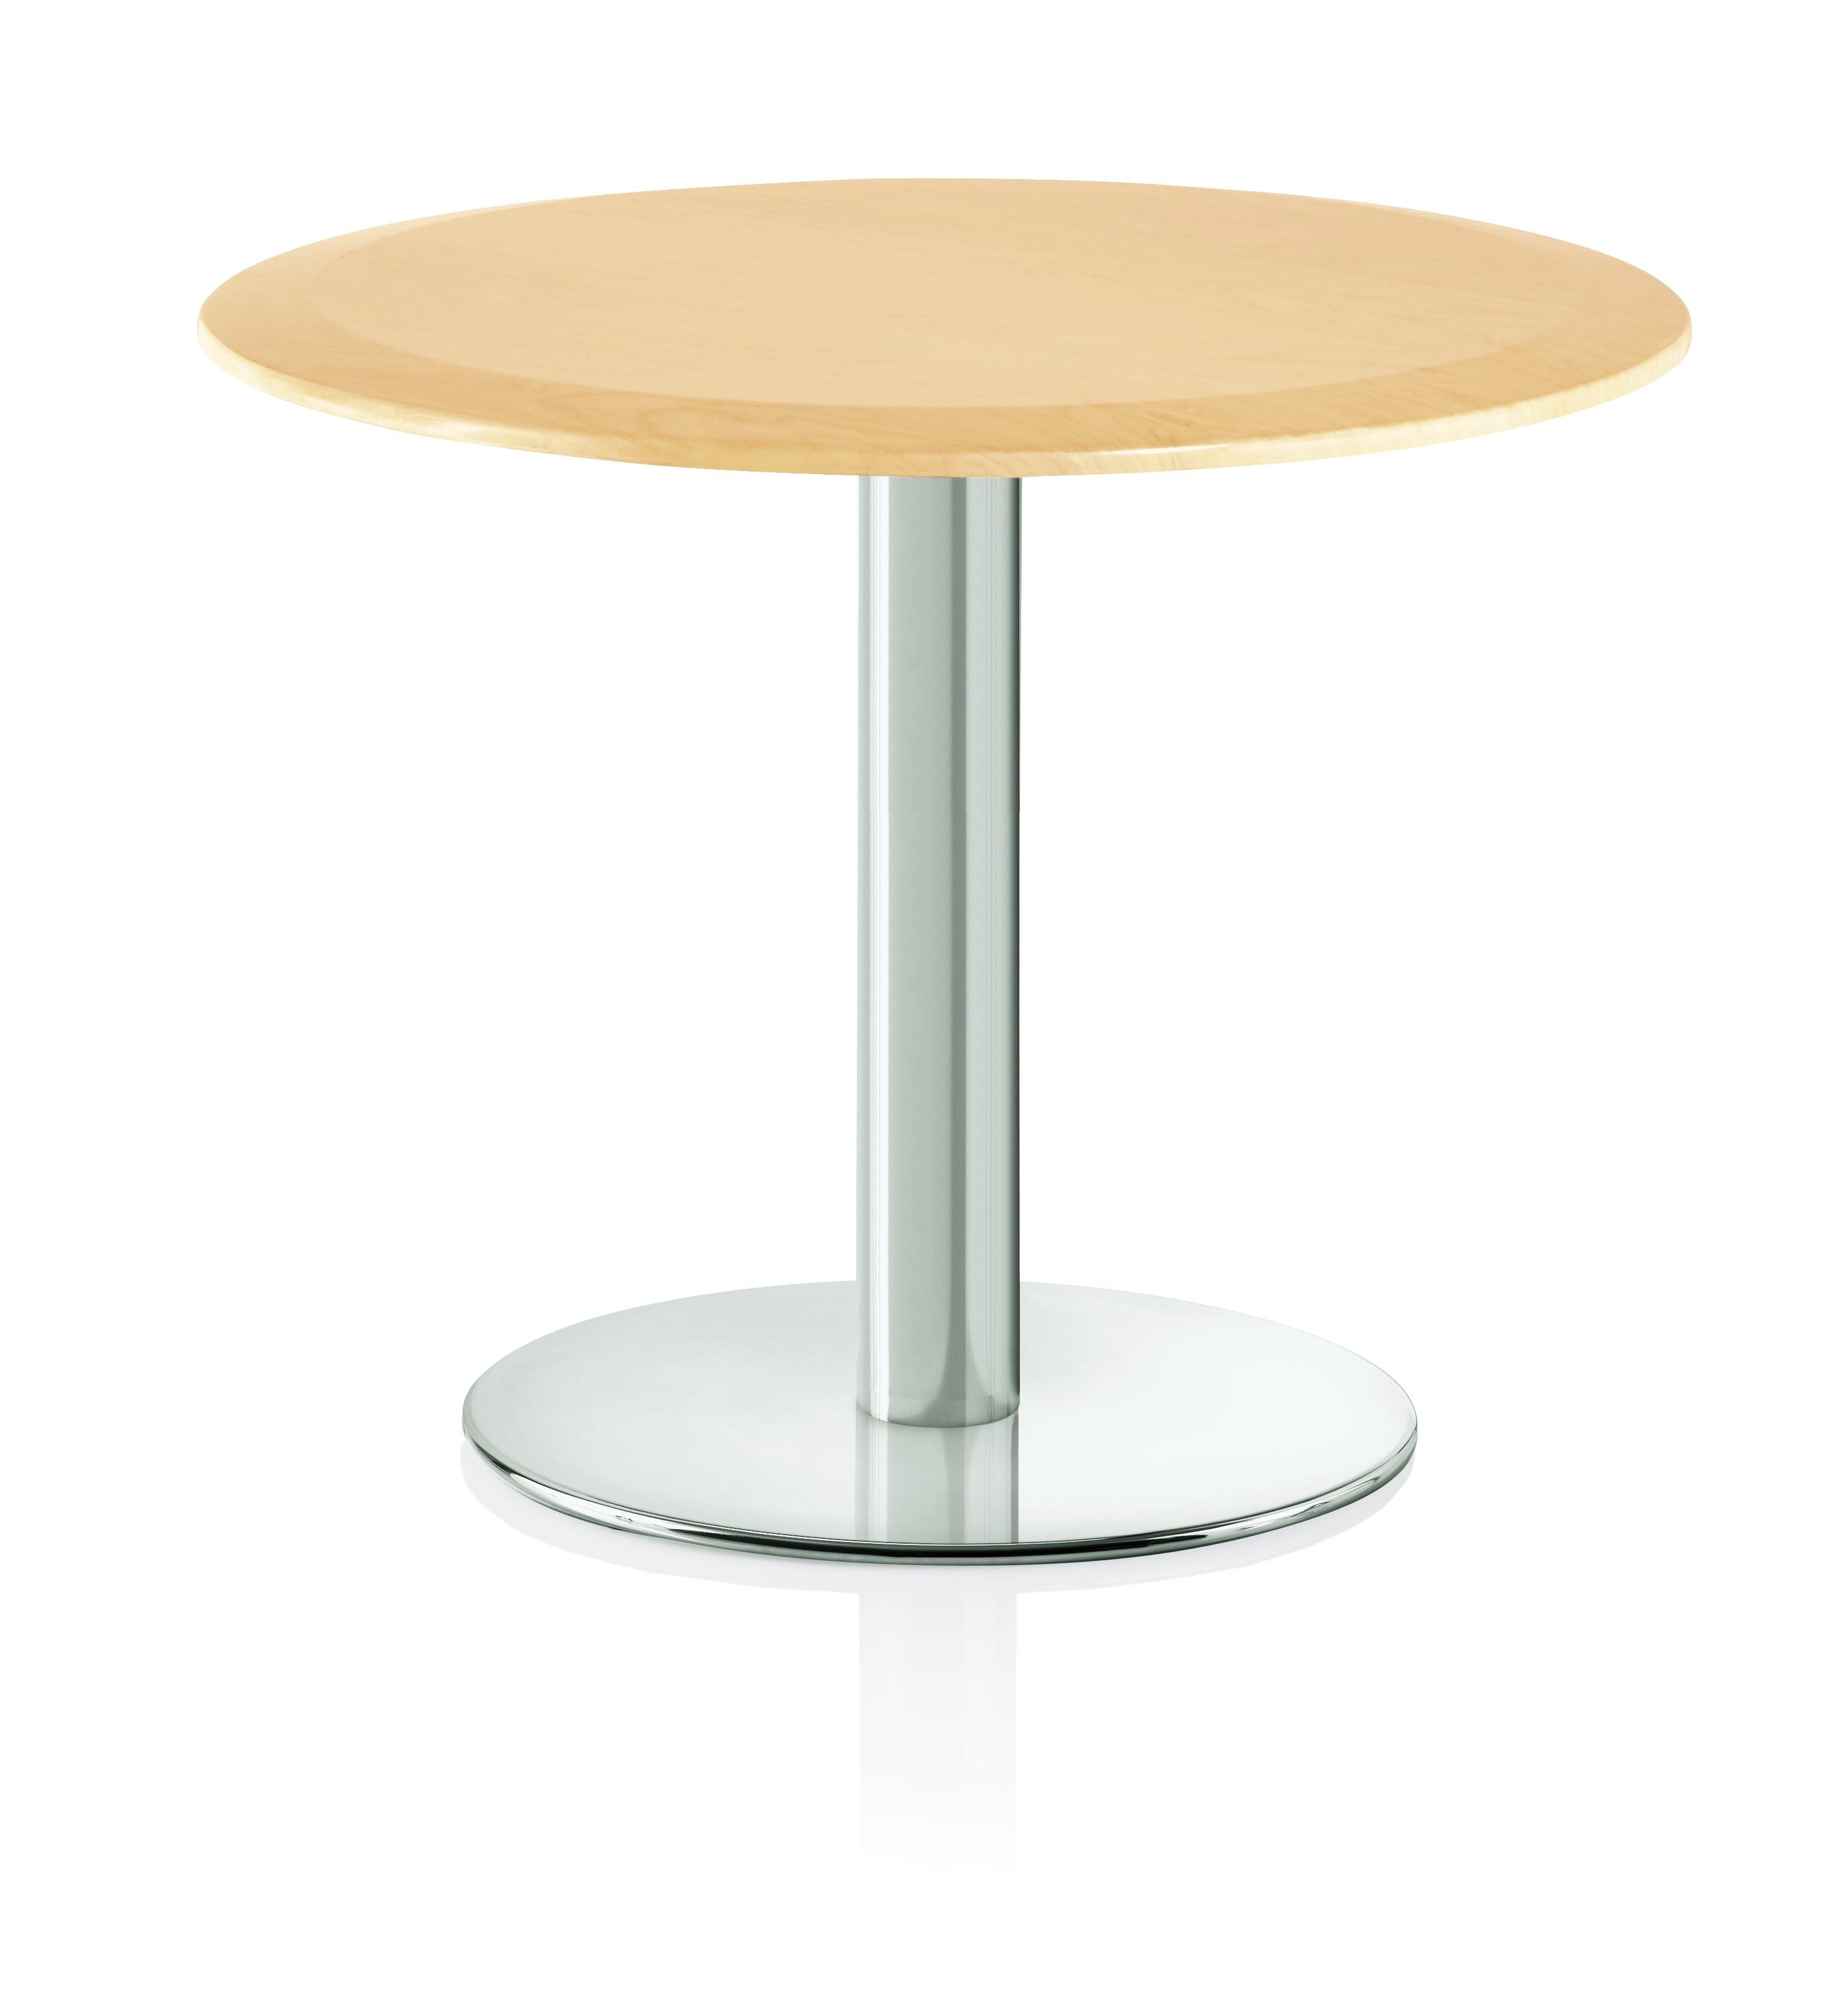 Ikea Lack Coffee Table Lack Coffee Table Ikea Lack Coffee Table Coffee Table Dimensions [ 1550 x 1200 Pixel ]